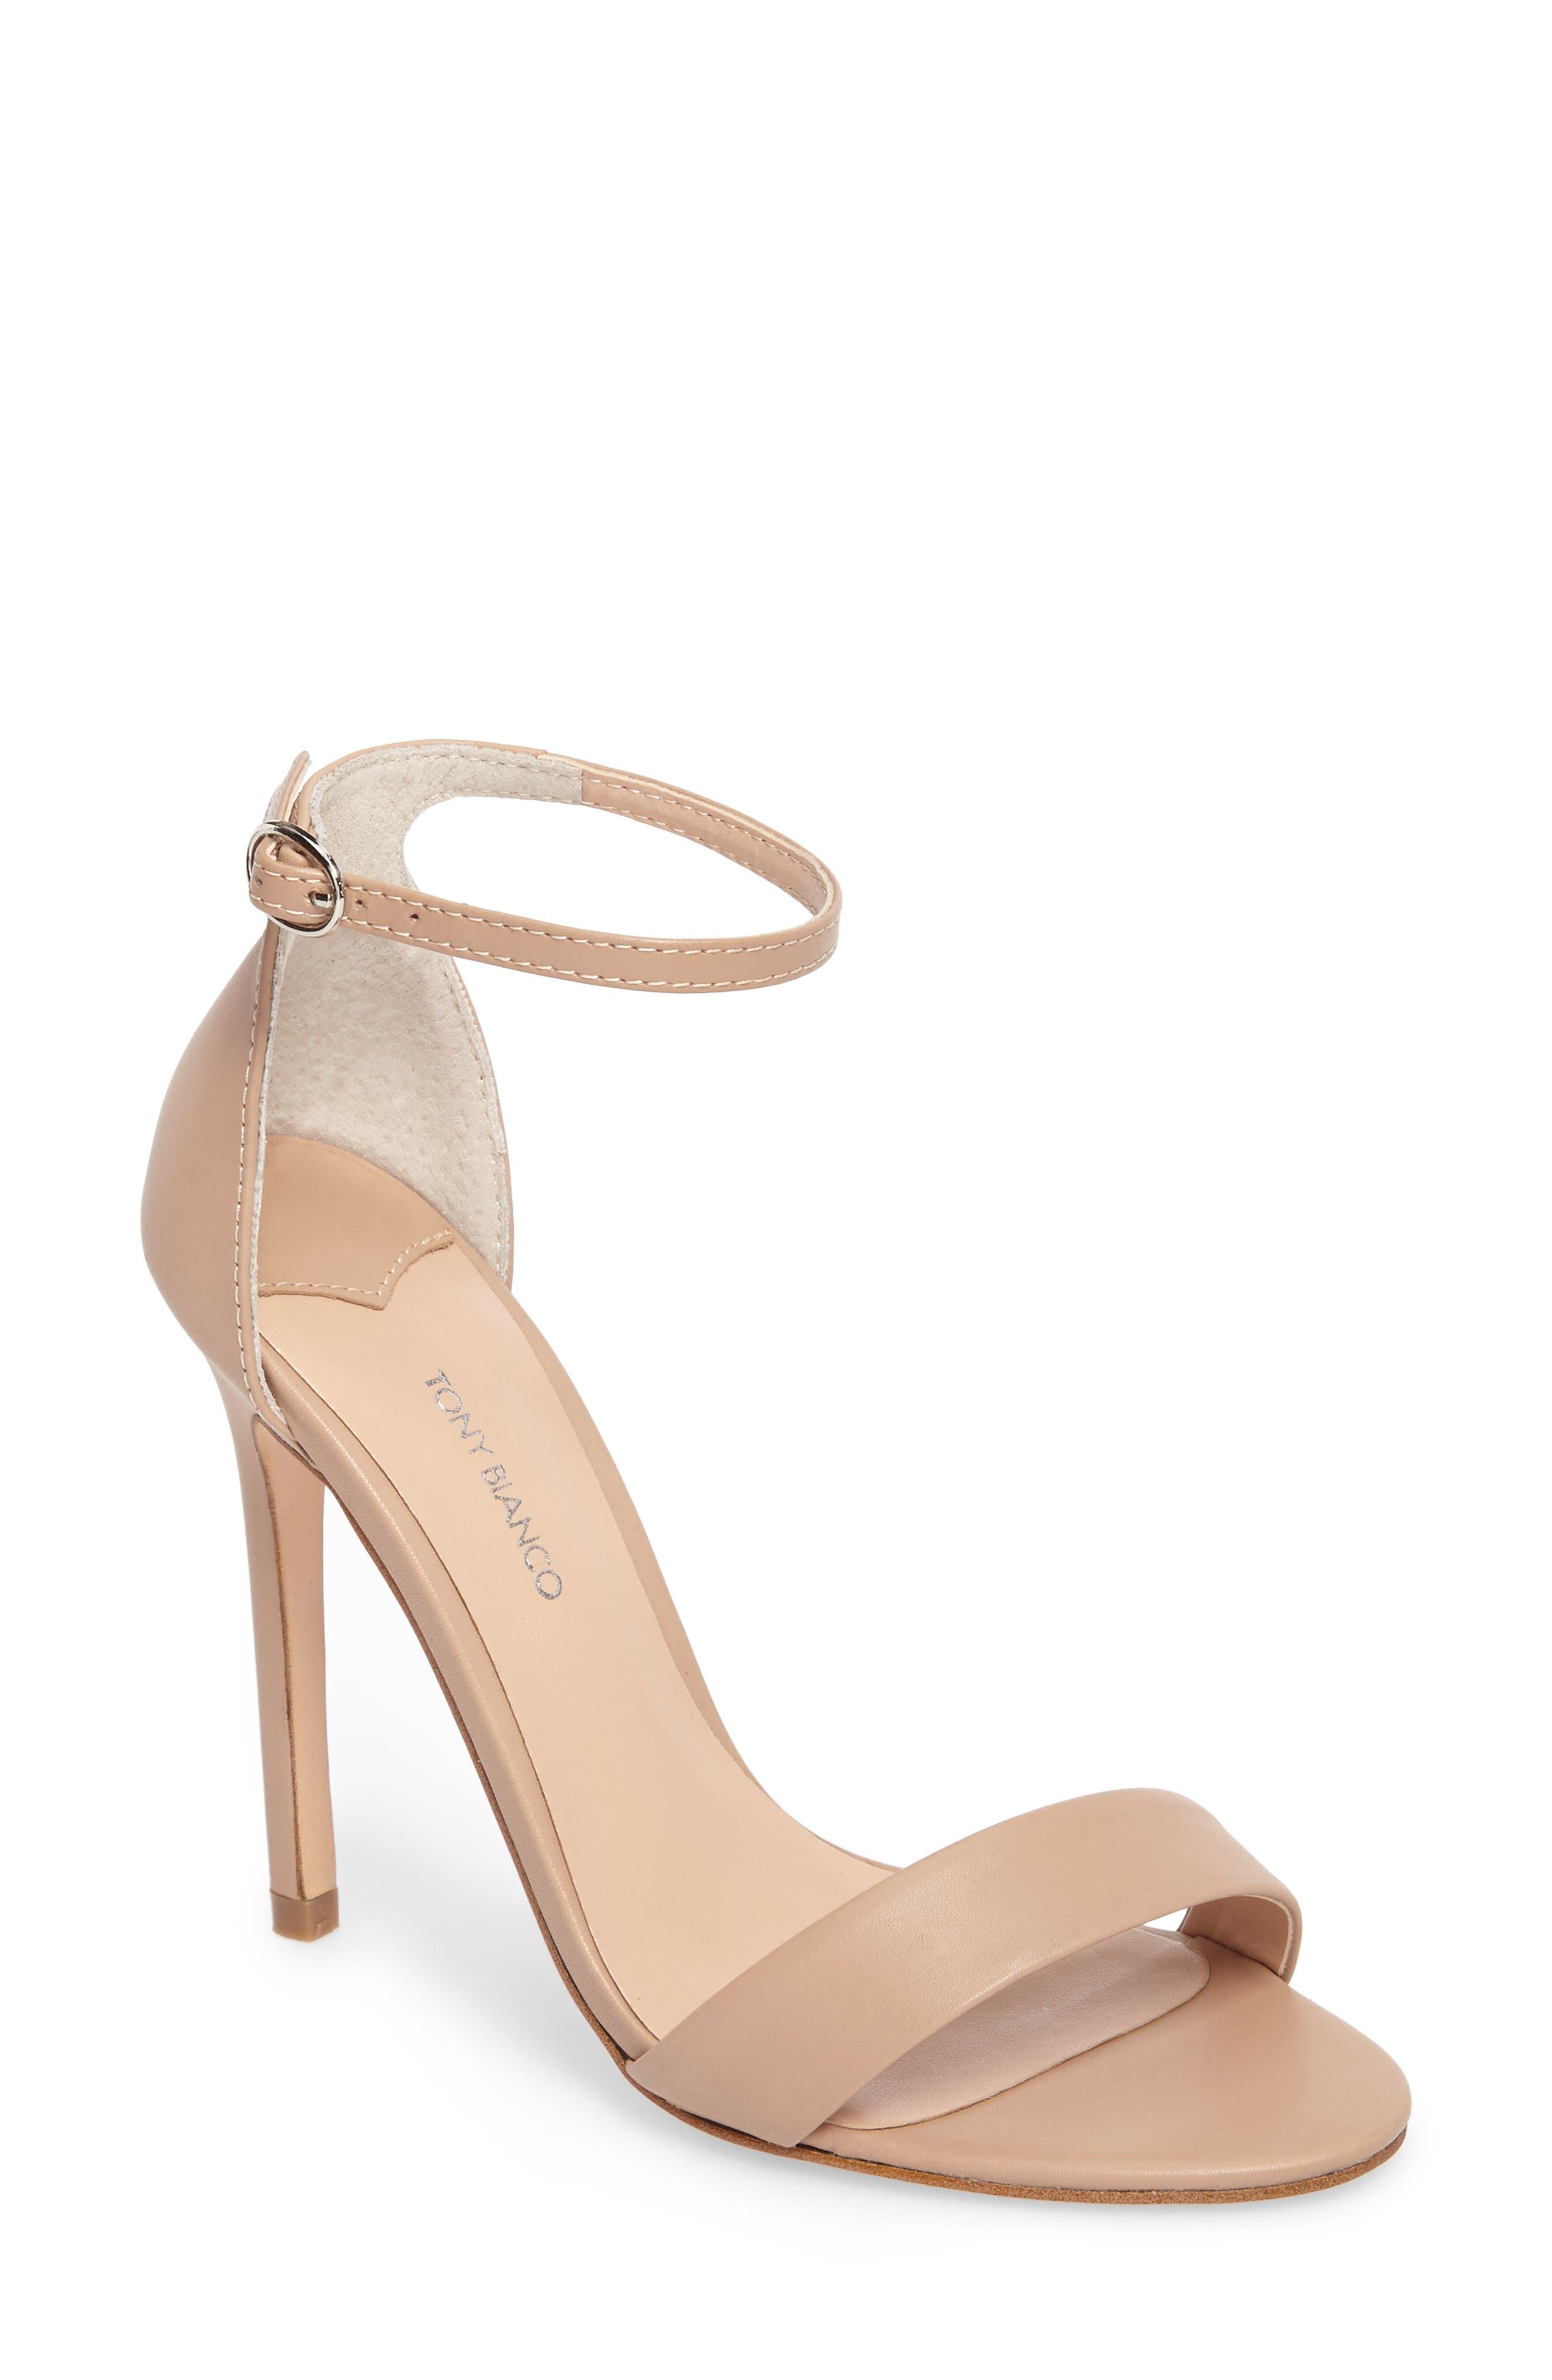 Alternate Image 1 Selected - Tony Bianco Karvan Ankle Strap Sandal (Women)